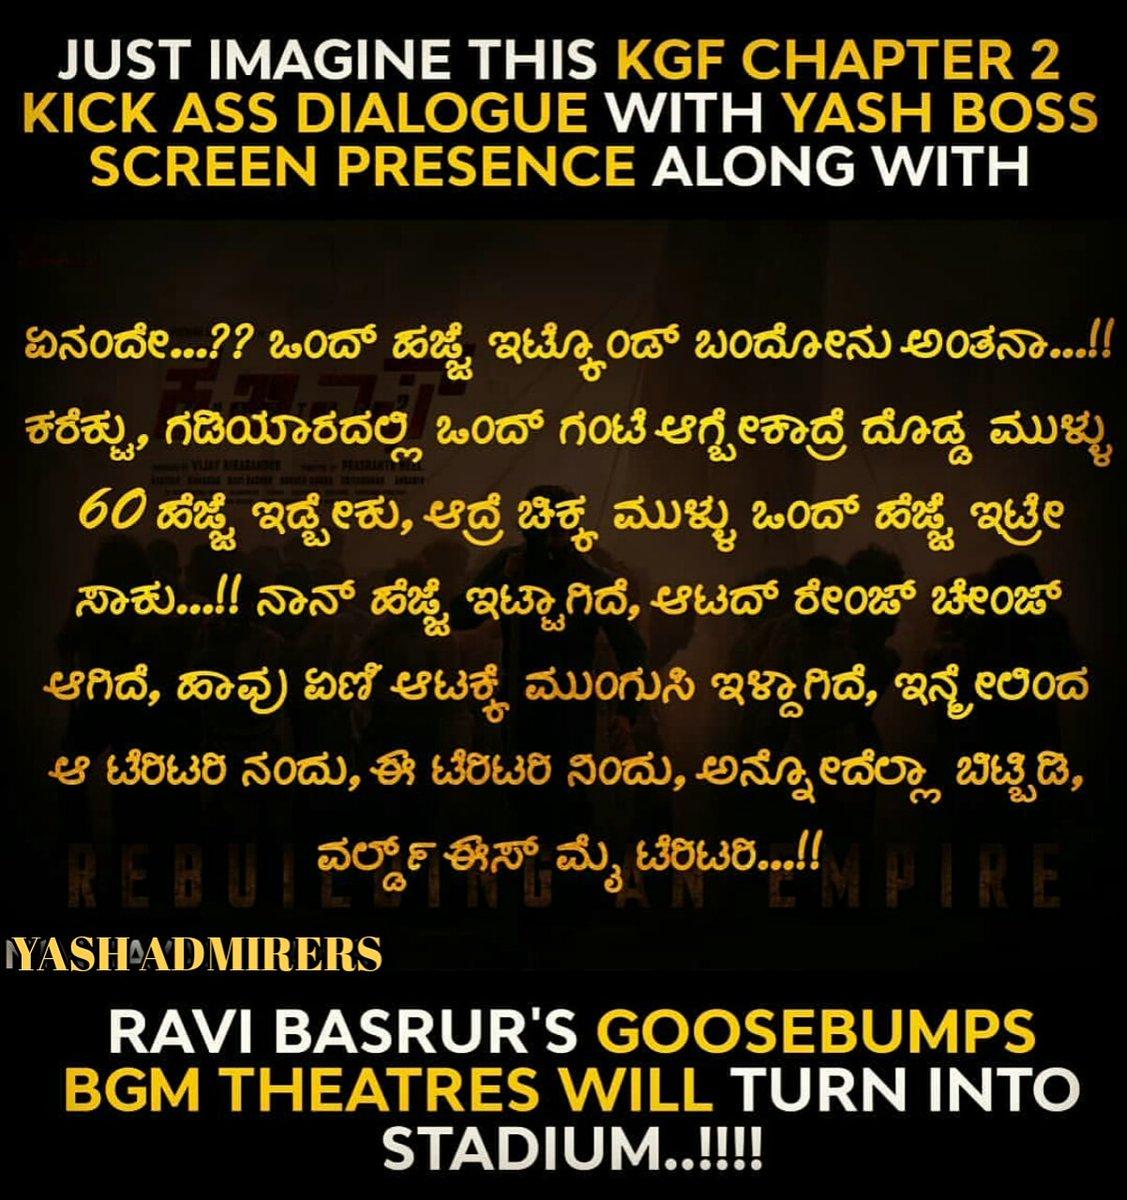 #KGFChapter2 #KGF #KGF2 #kgf2firstlook #rockybhai #kannada #hindhi #Yash #tamil #telgu #Karnataka #Maharashtra #Hollywood #Tollywood #iamradhikapandit #ayrayashpic.twitter.com/DAscmOuazU